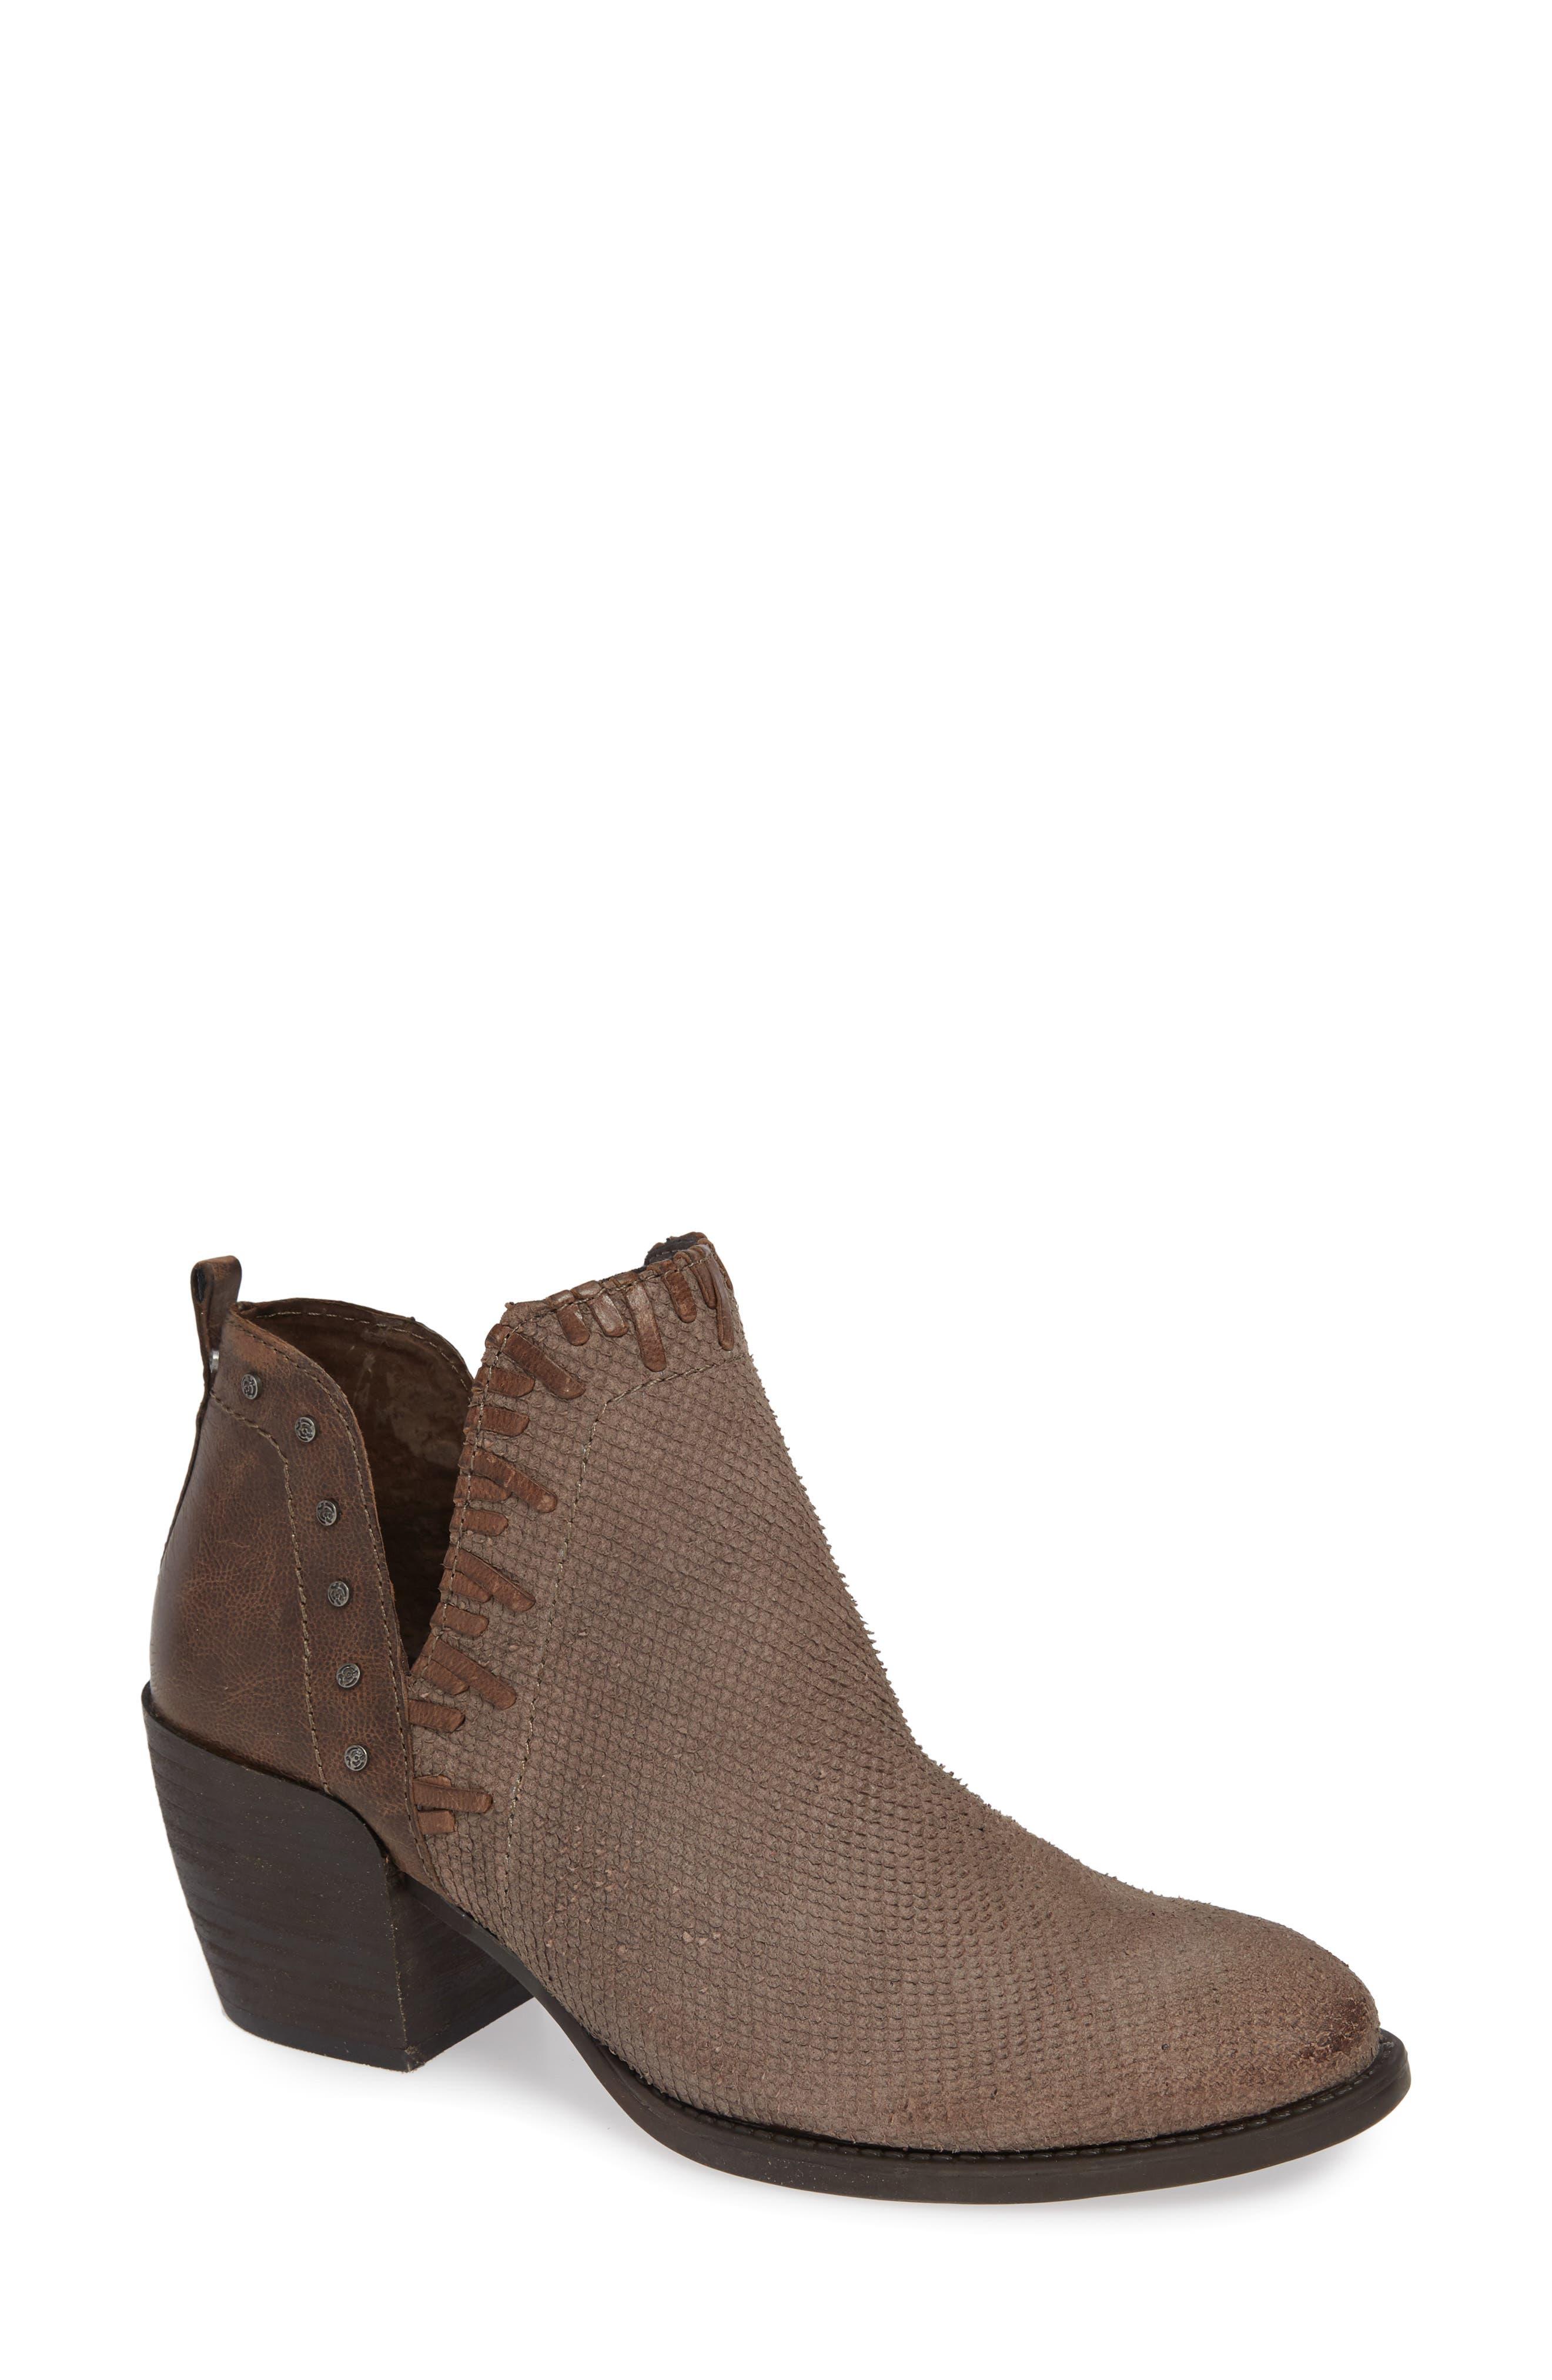 Otbt Santa Fe Ankle Bootie- Grey